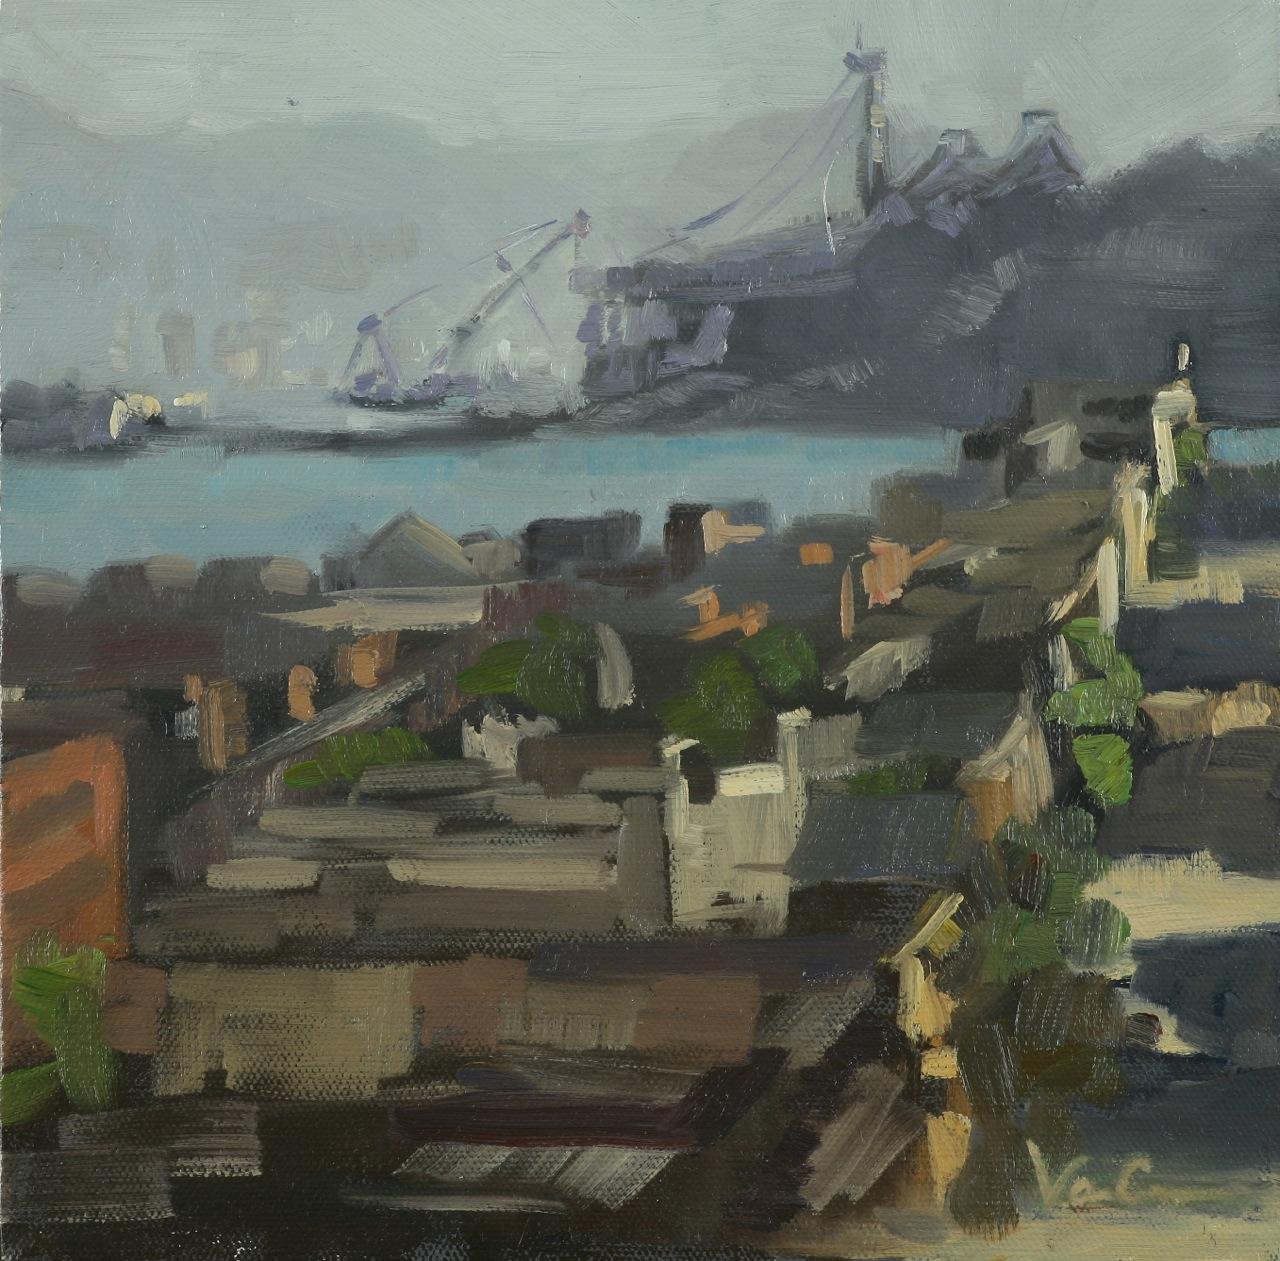 Rebuilding The Bay Bridge, Oil on Canvas, Starting Bid $175.00 Value: $400.00